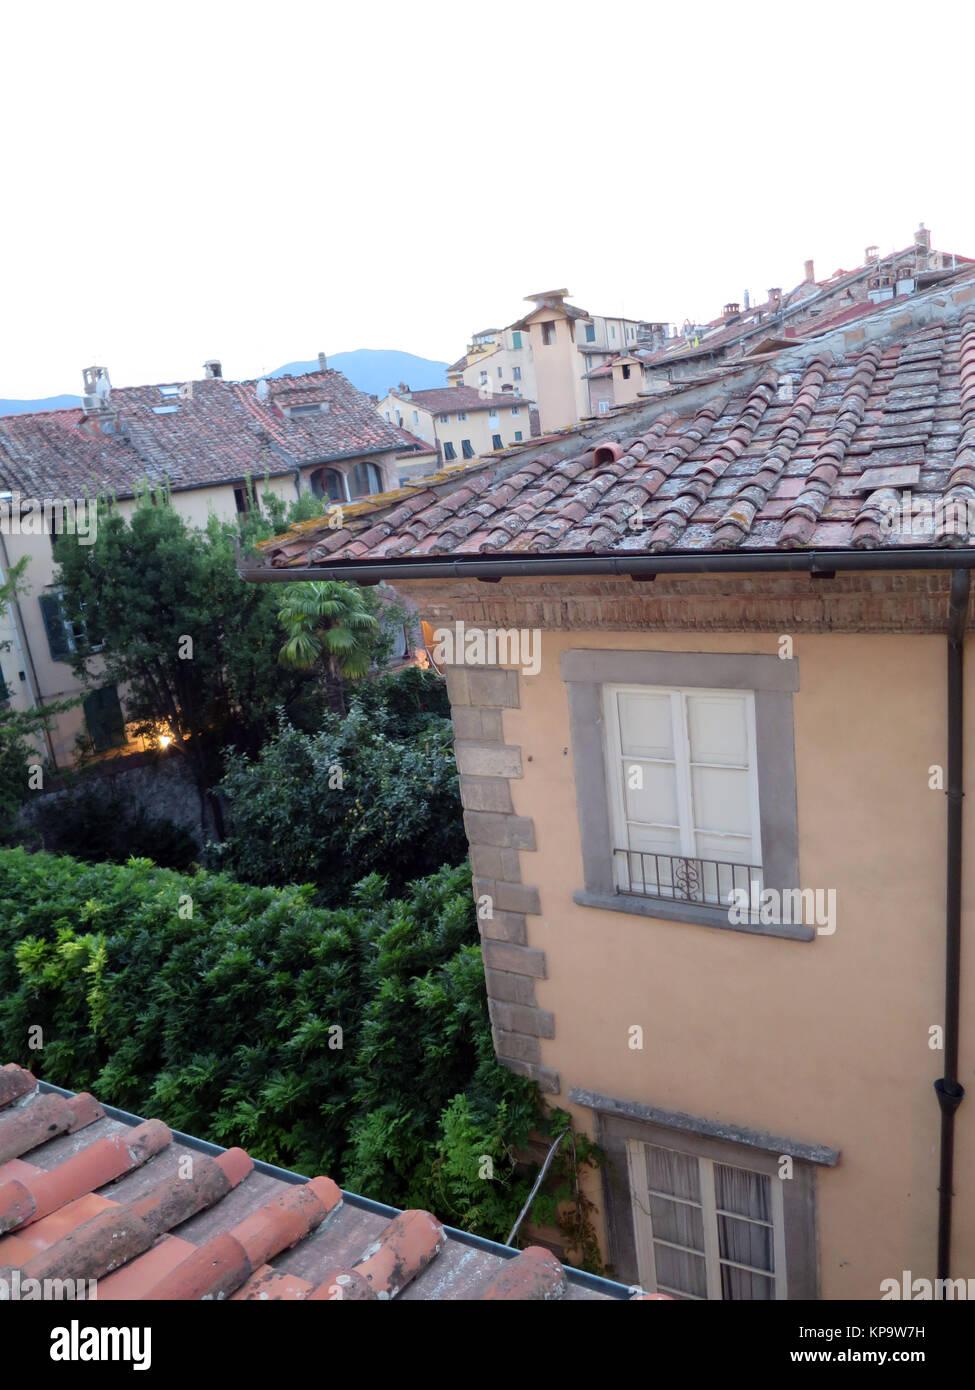 Blick aus dem Fenster über die Dächer , Lucca, Toskana, Italien Stock Photo